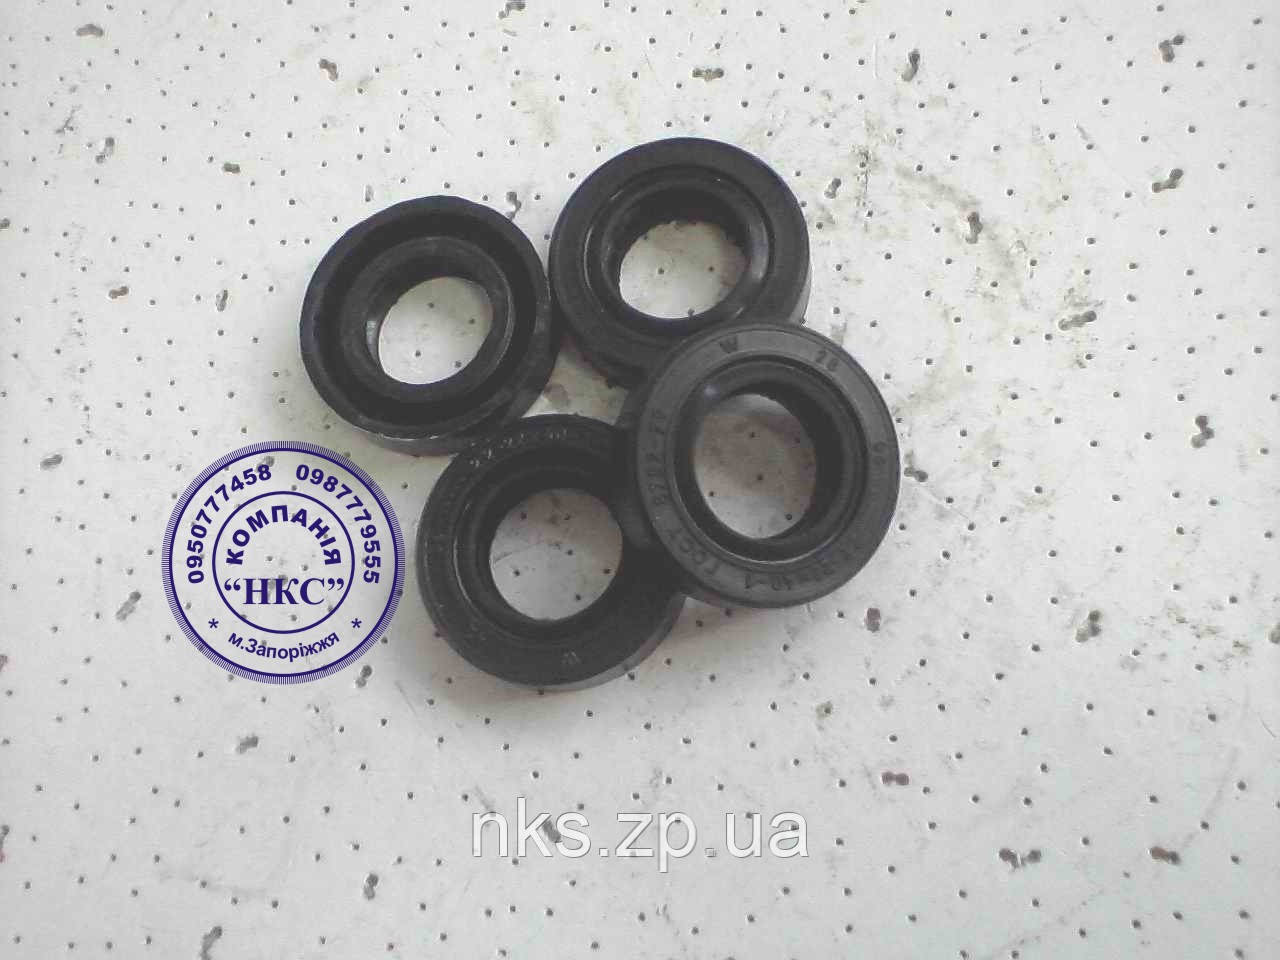 Манжета резино-армированная 22х40 СУПН-8.